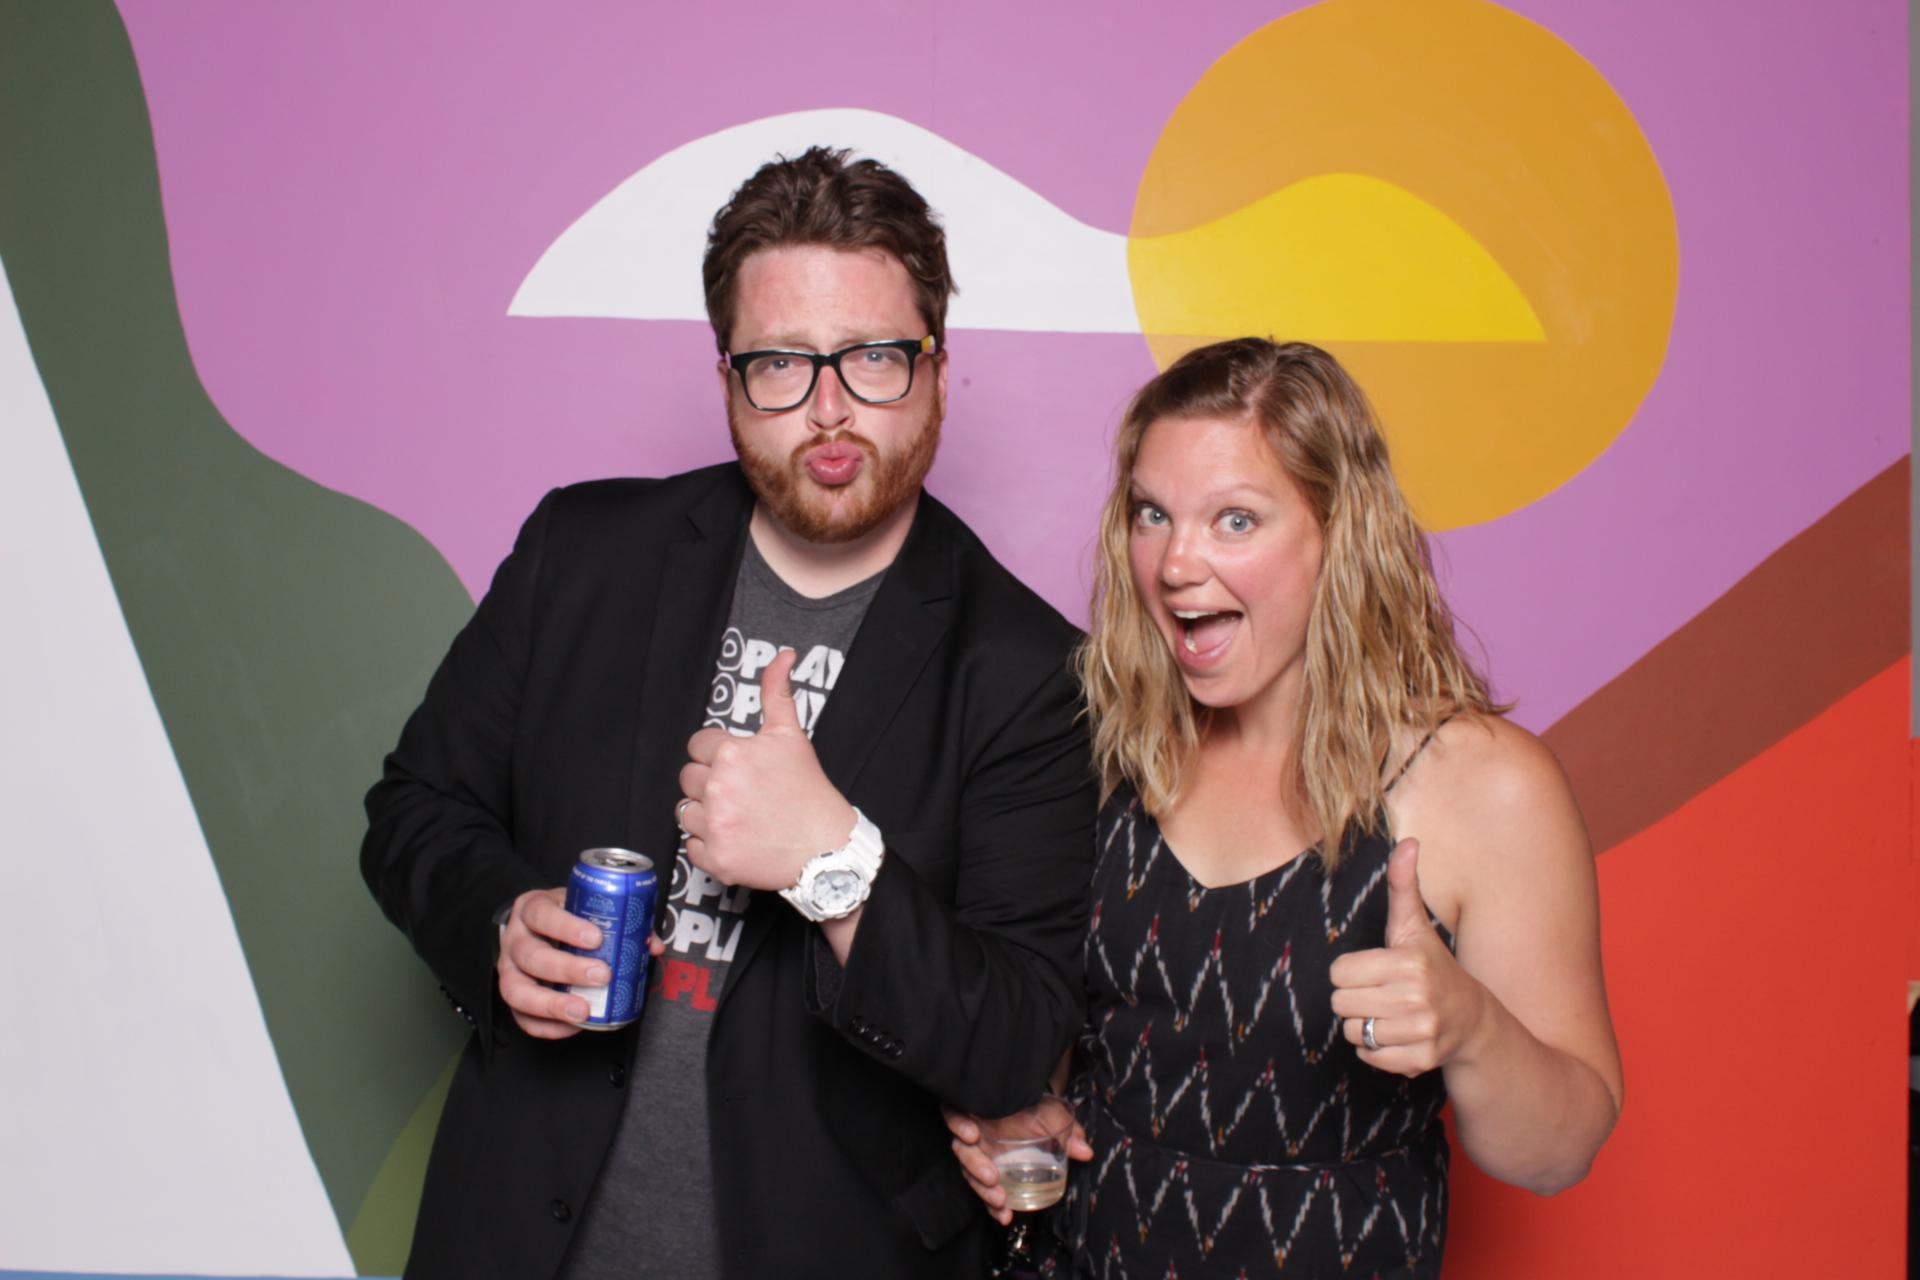 Minneapolis_St Paul_Photo_Booths_Wedding_Reception (8).jpg